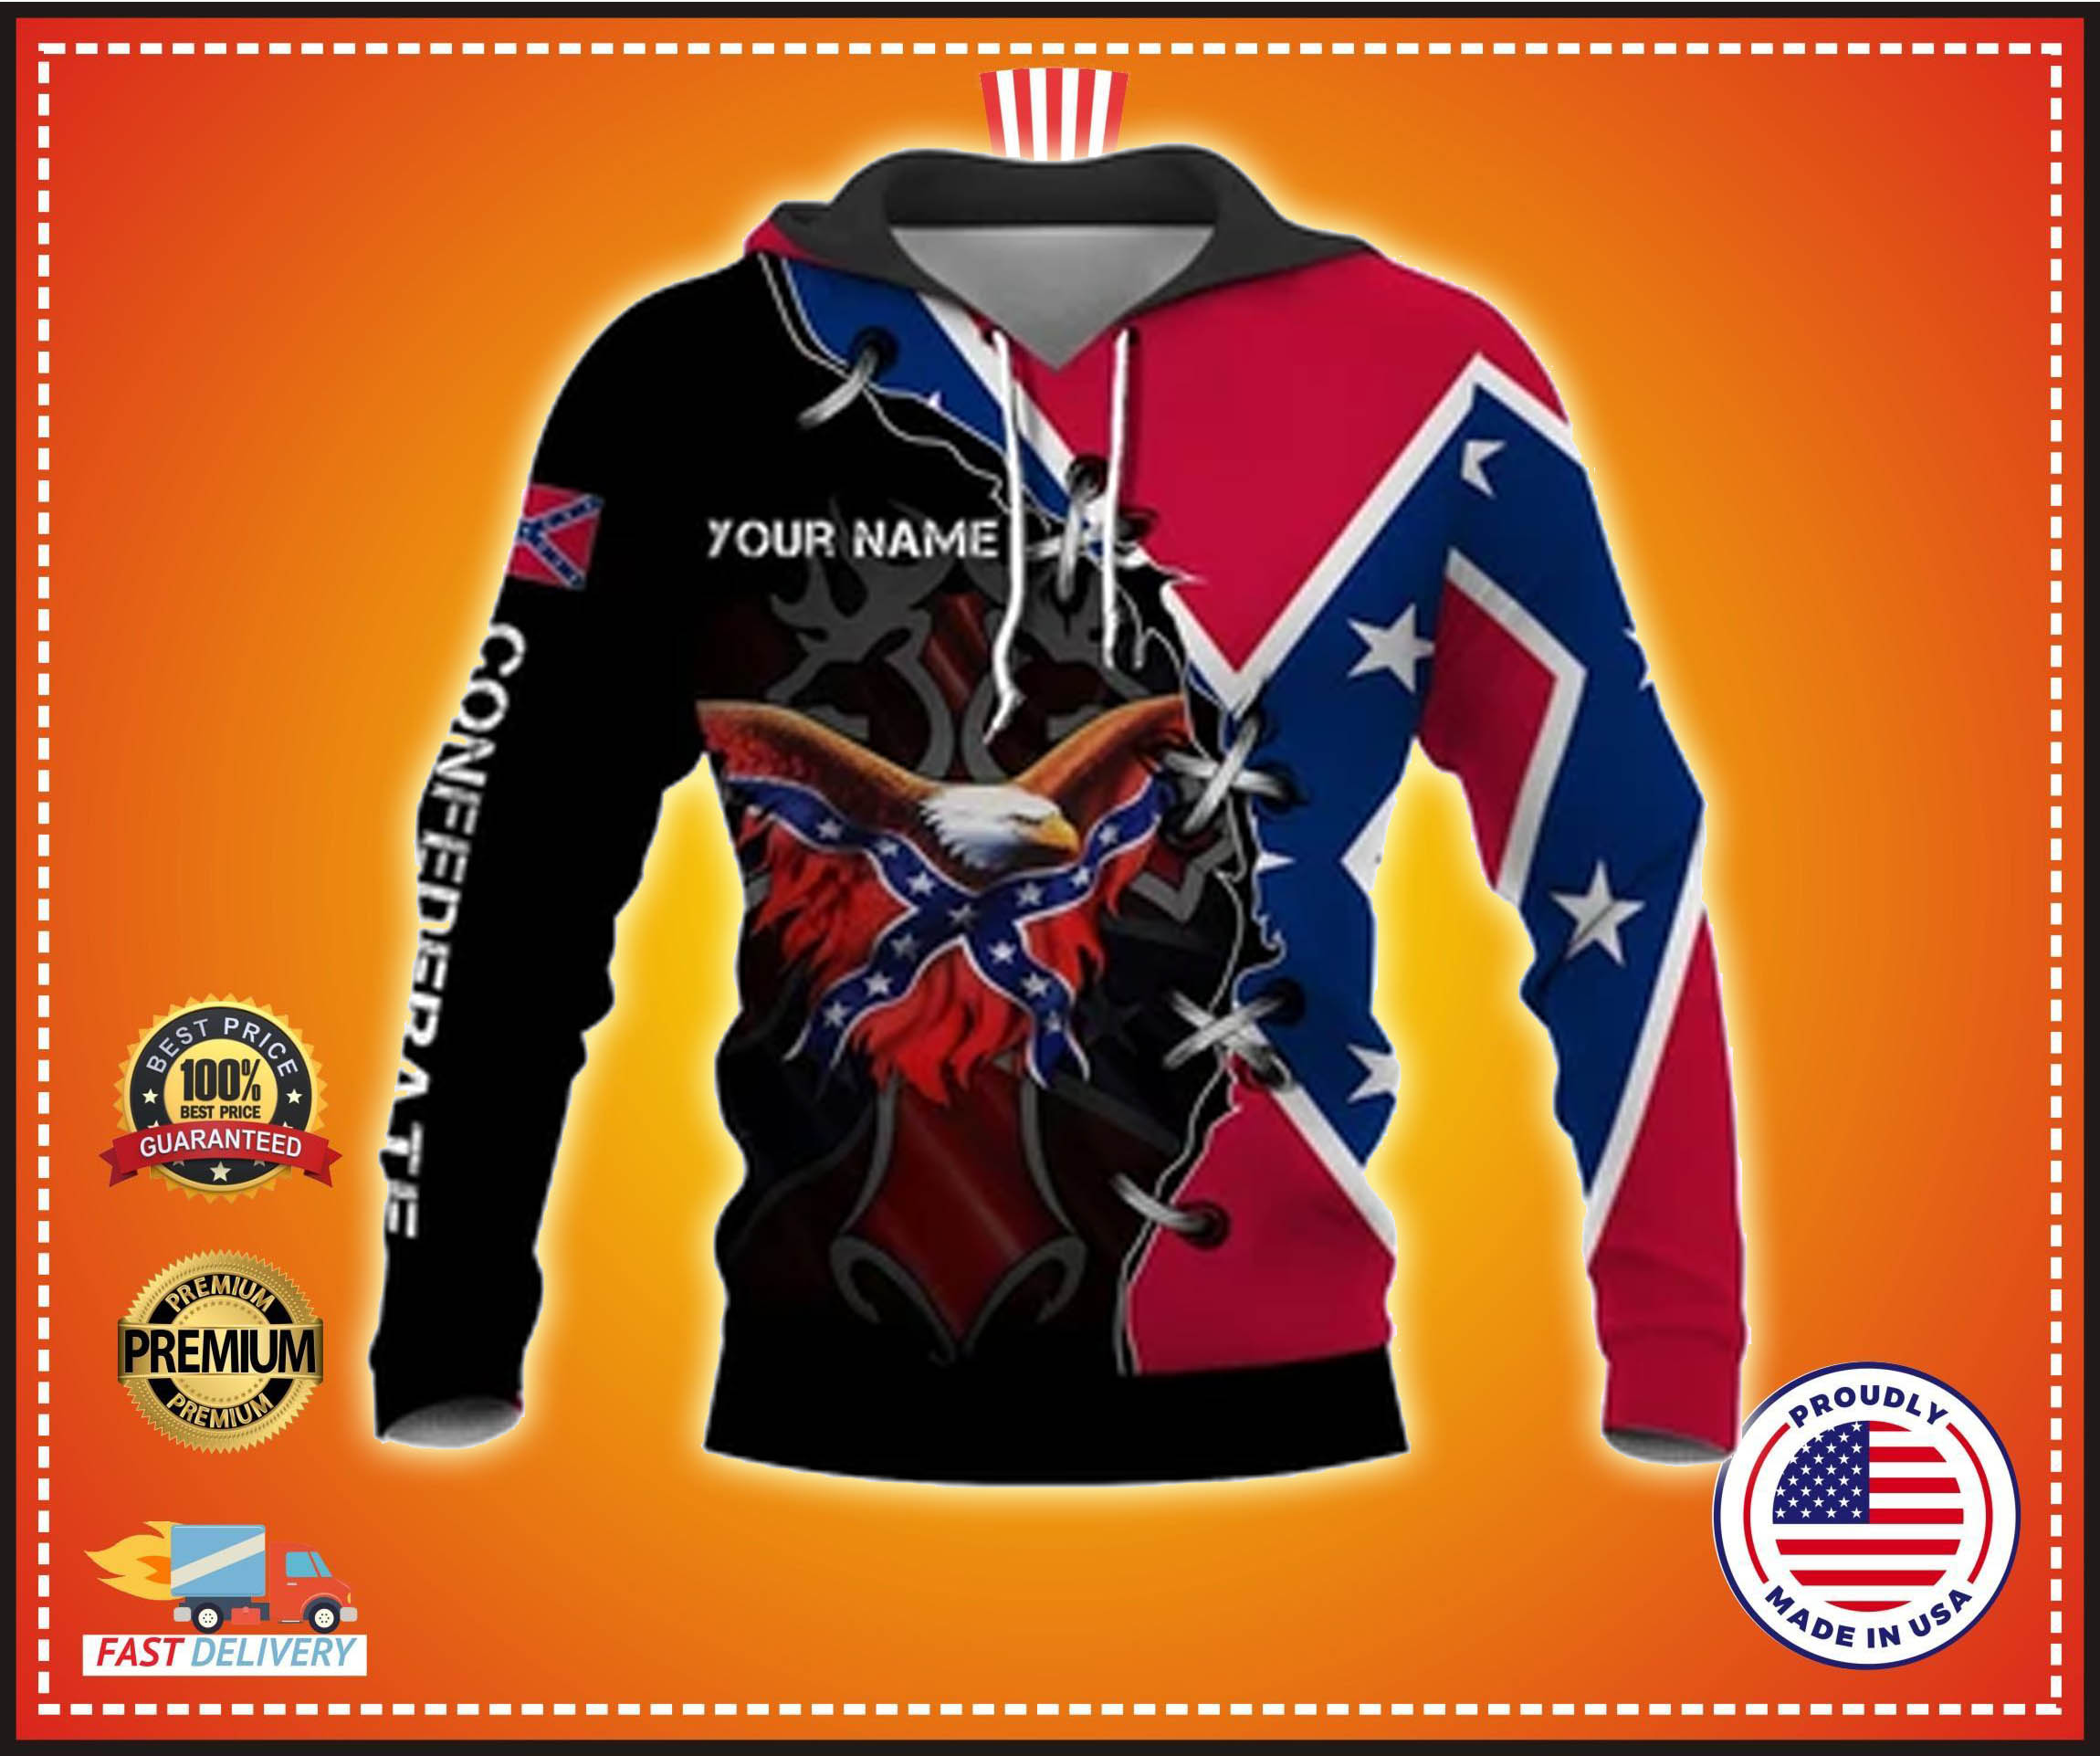 Eagle confederate flag custom name 3d hoodie - LIMITED EDITION